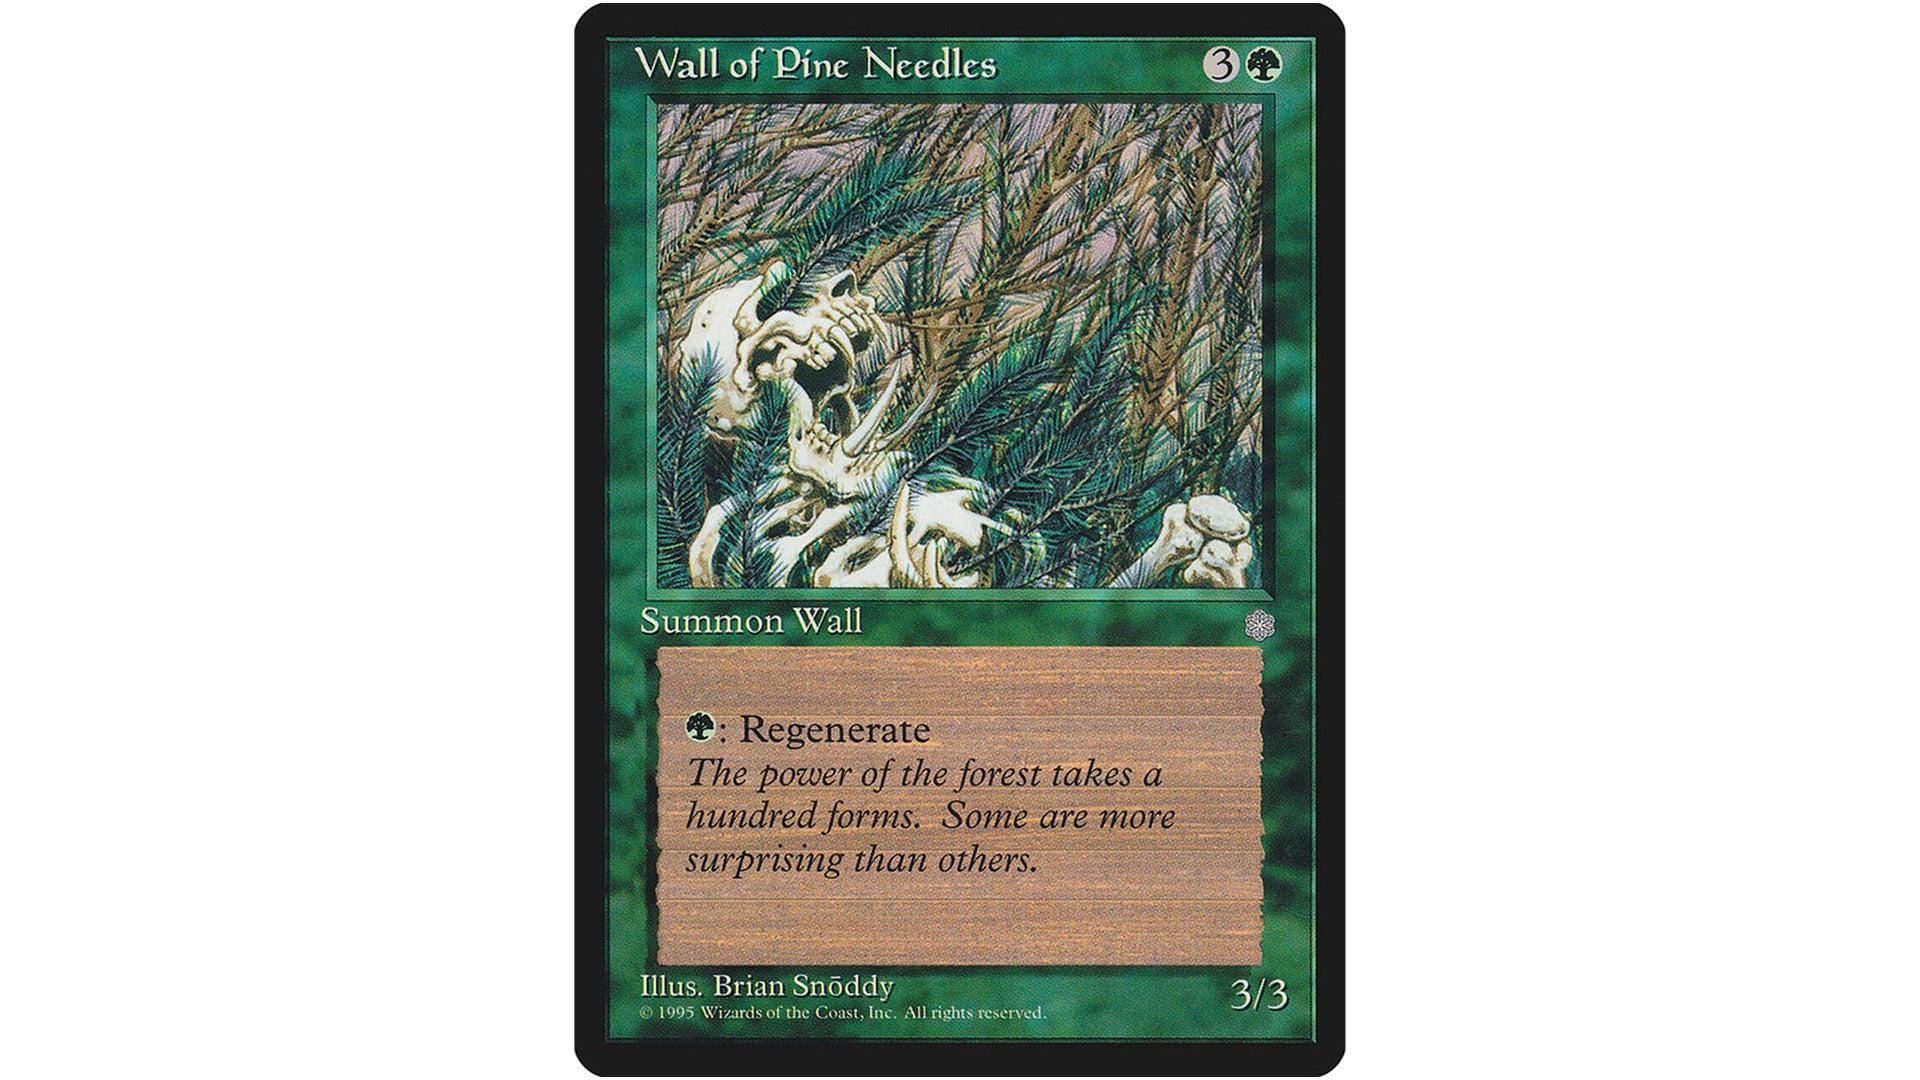 mtg-christmas-card-wall-of-pine-needles.jpg